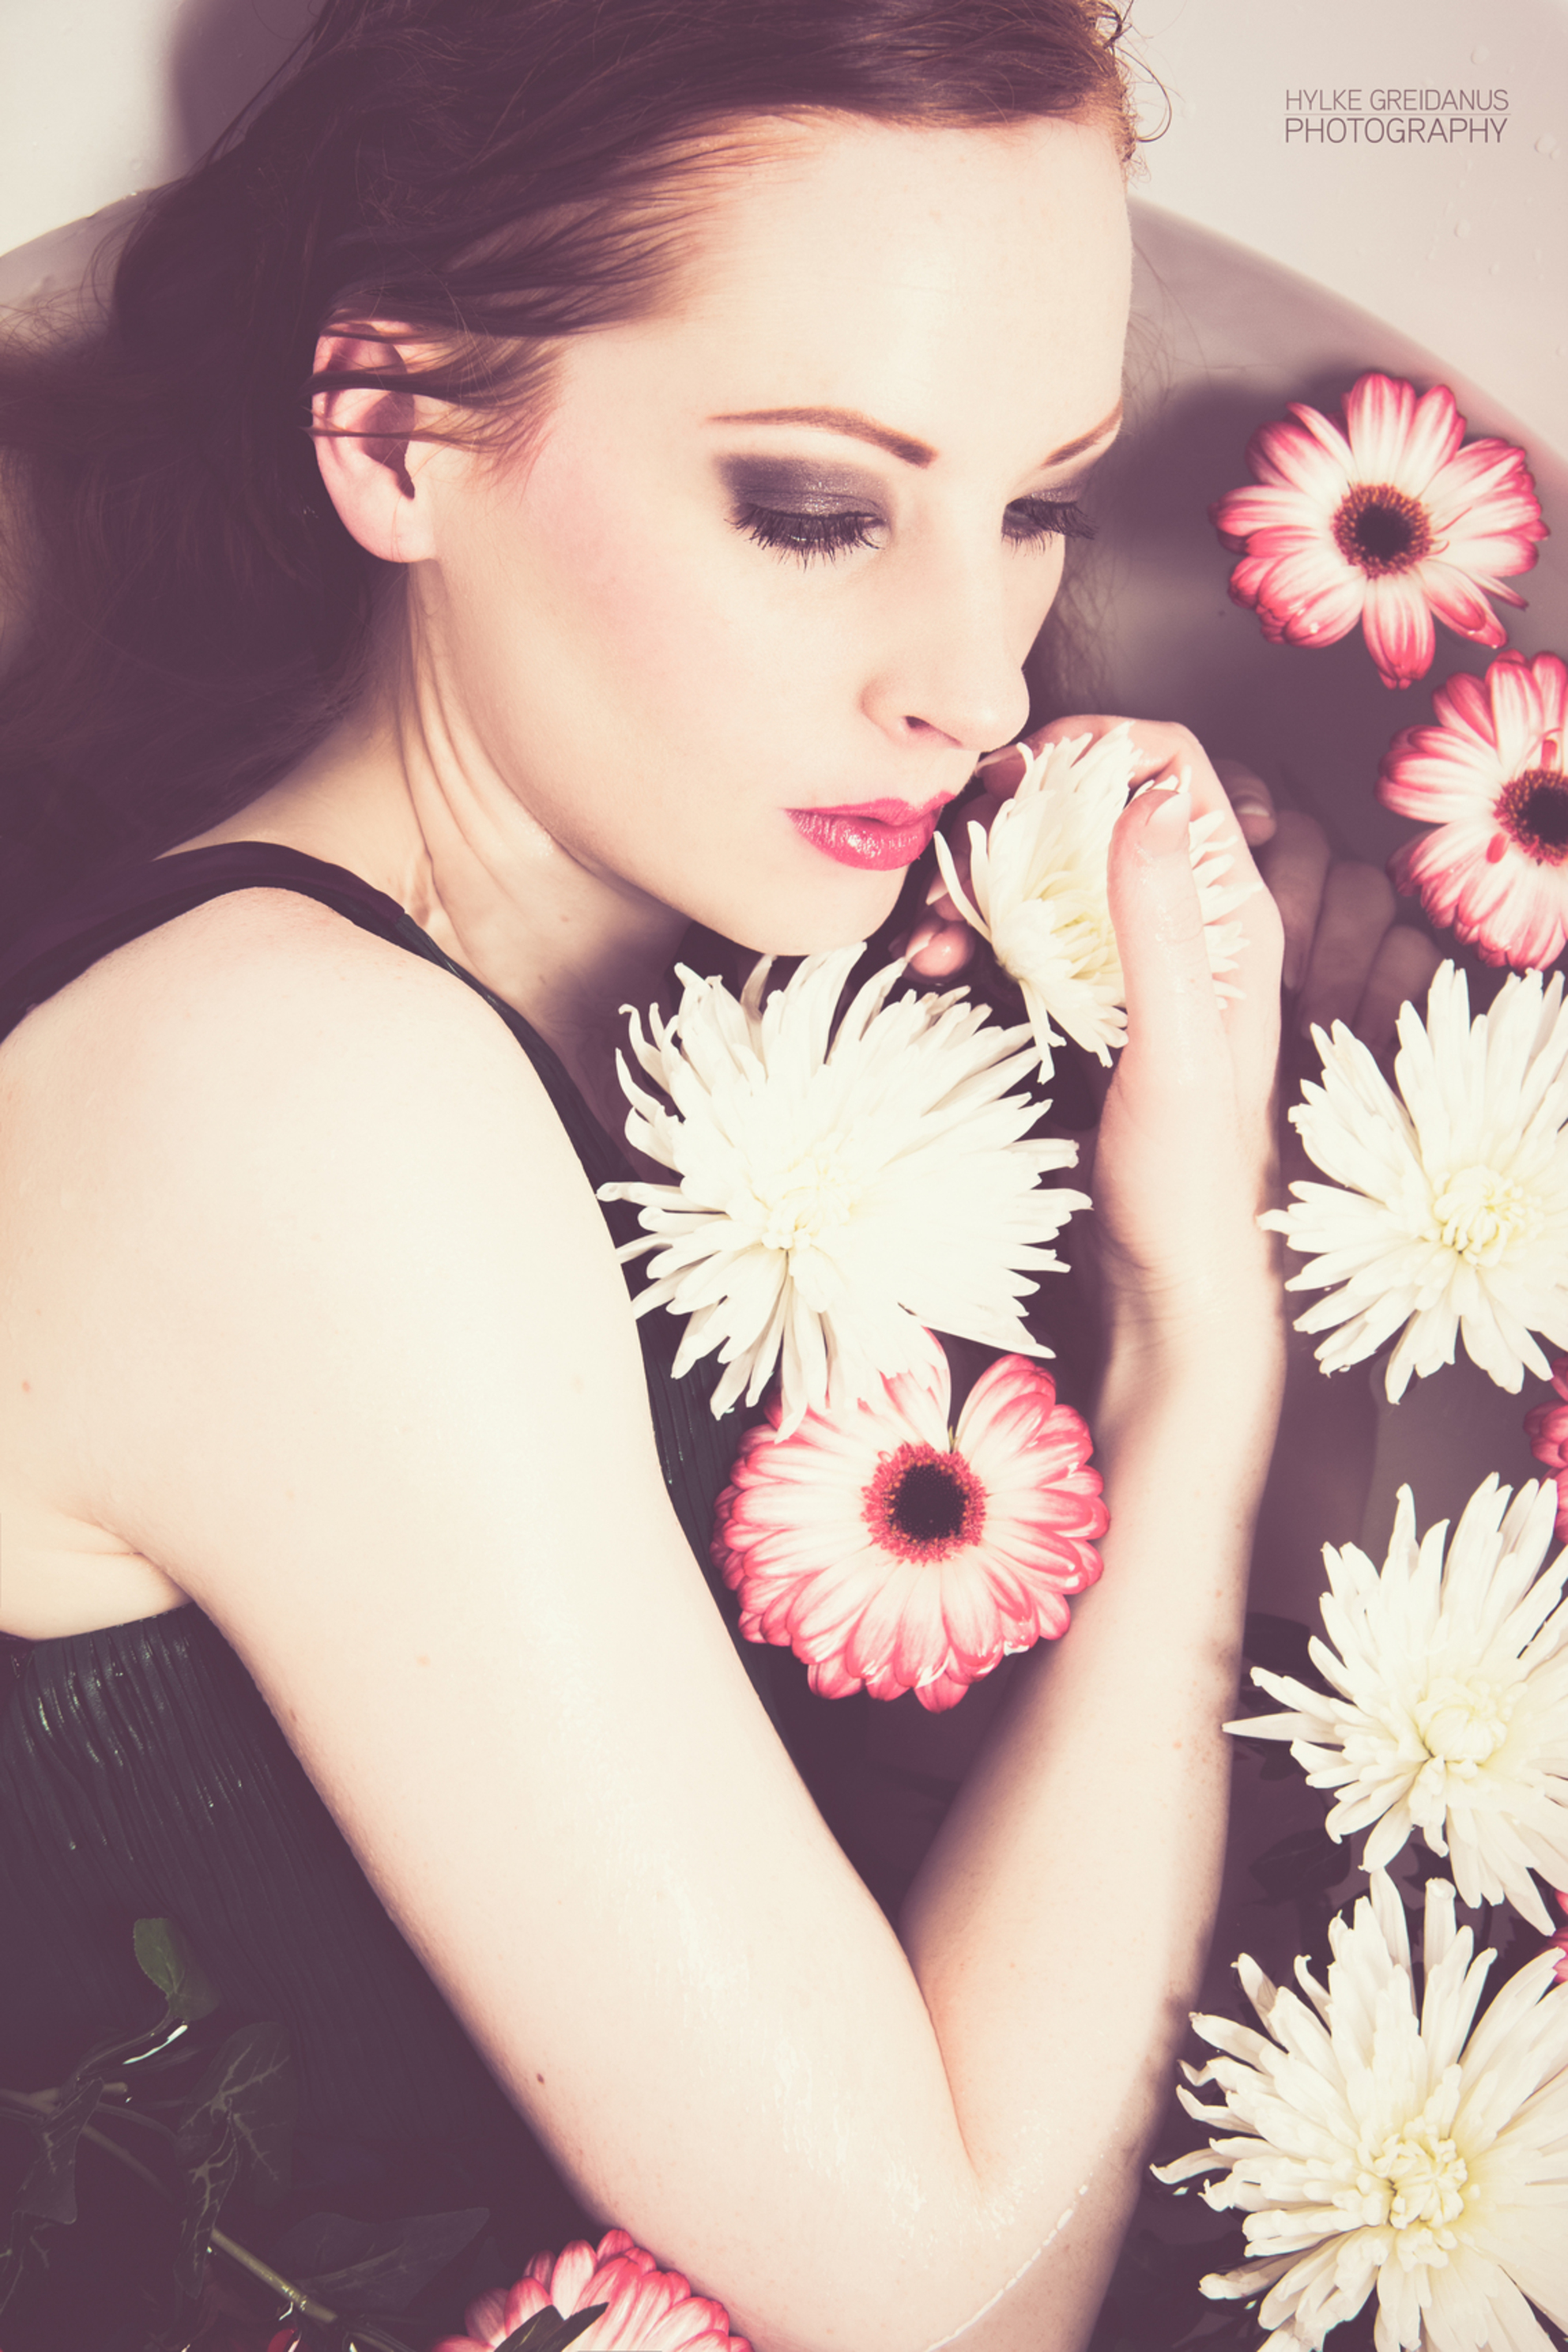 Bath Girl. - Model: Carlijn Guns Muah: Annemieke vreugdenhil - foto door hylke-greidanus op 20-08-2014 - deze foto bevat: vrouw, kleur, water, licht, portret, bloemen, model, flits, haar, fashion, lippen, beauty, flowers, pose, glamour, kapsel, belichting, expressie, jurk, mode, fotoshoot, kleding, romantisch, locatie, makeup, styling, fashionfotografie